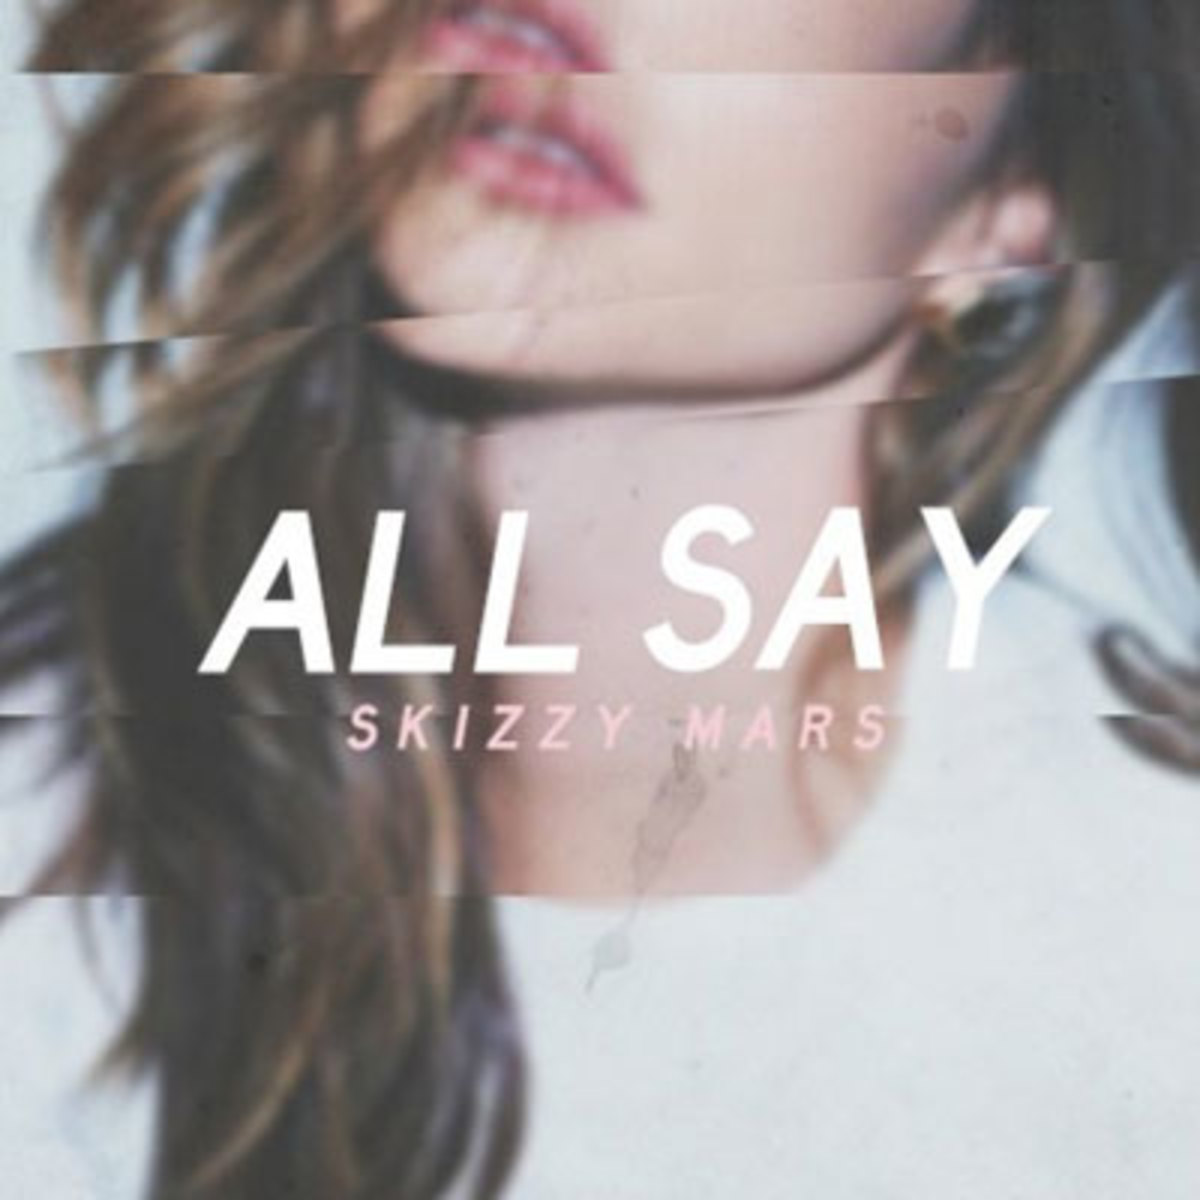 skizzymars-allsay.jpg